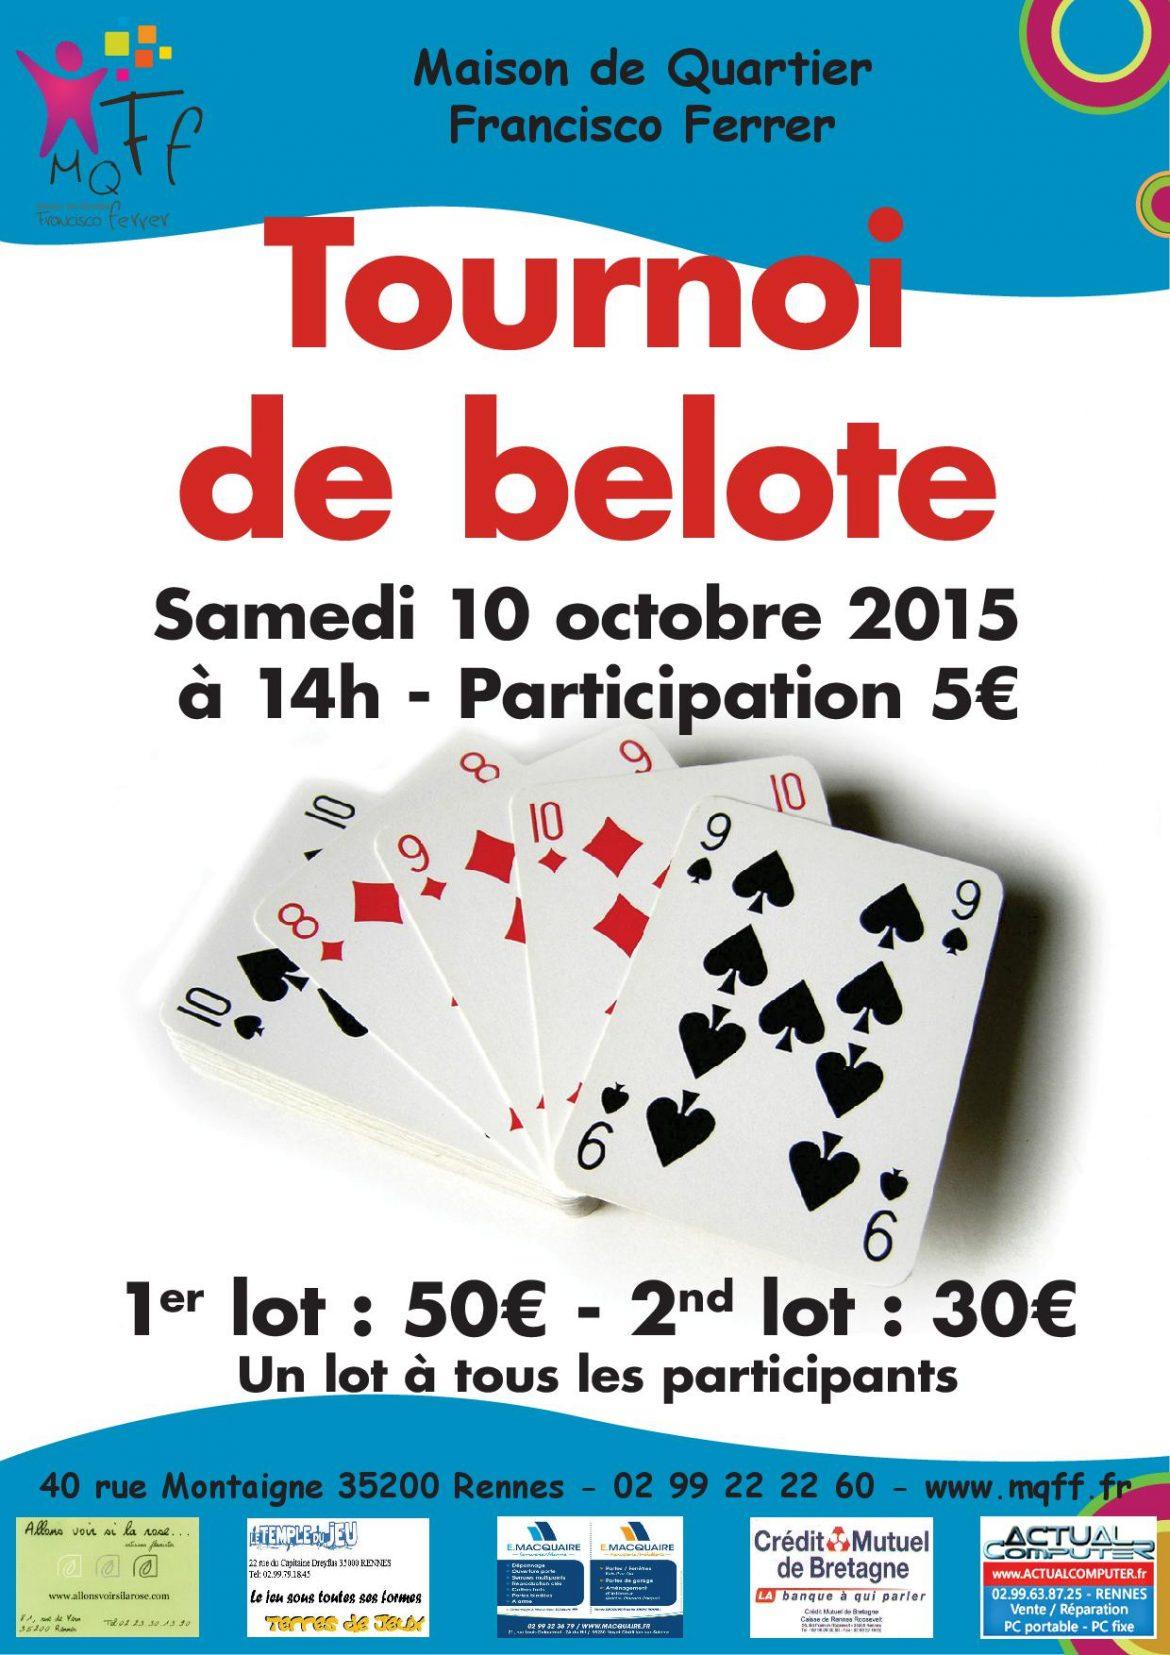 Tournoi de Belote Samedi 10 octobre 2015 à Rennes